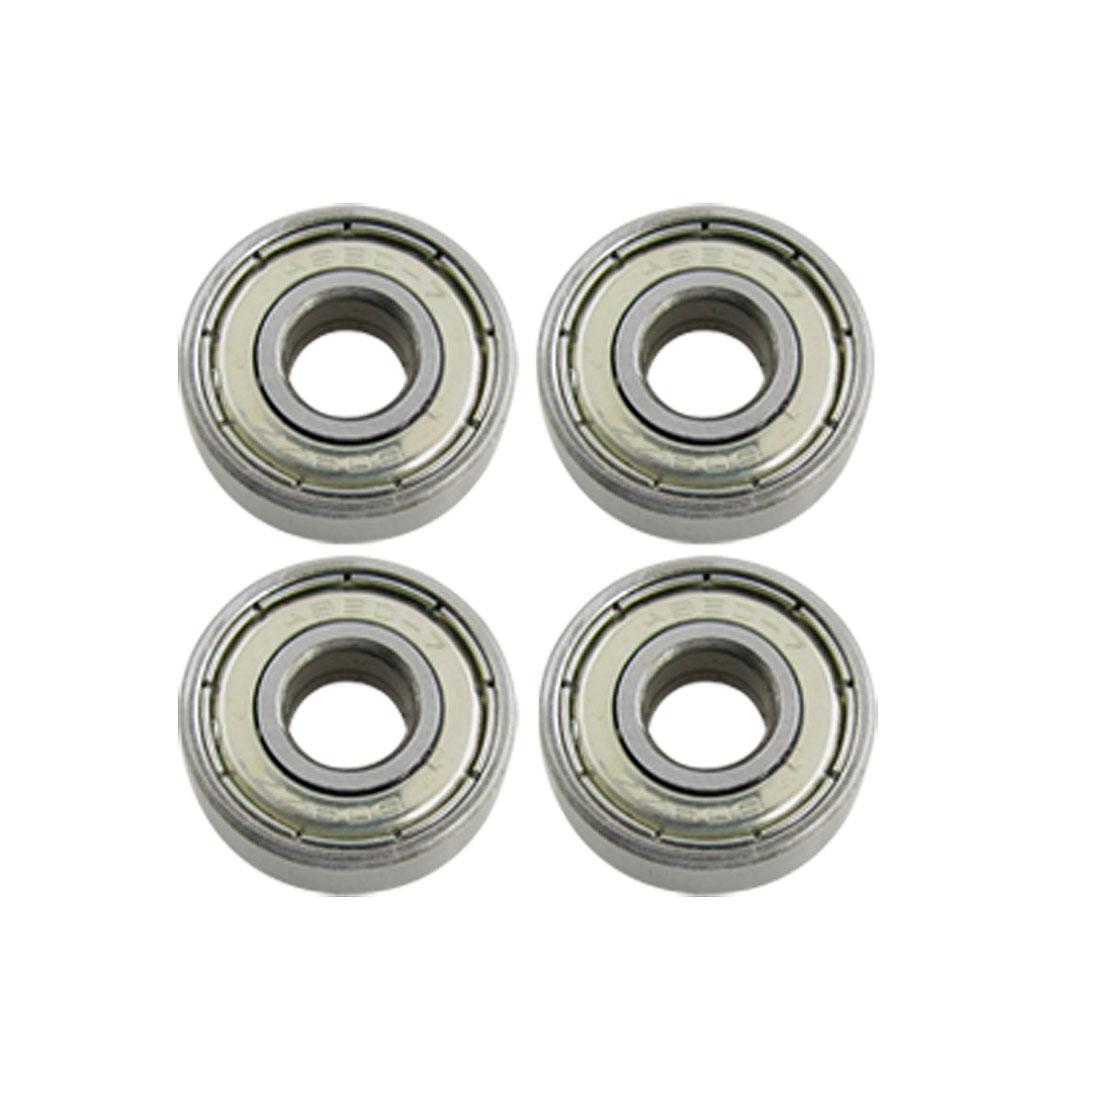 4 Pcs Deep 22mm Diameter Groove Roller-Skate Ball Wheel Bearings